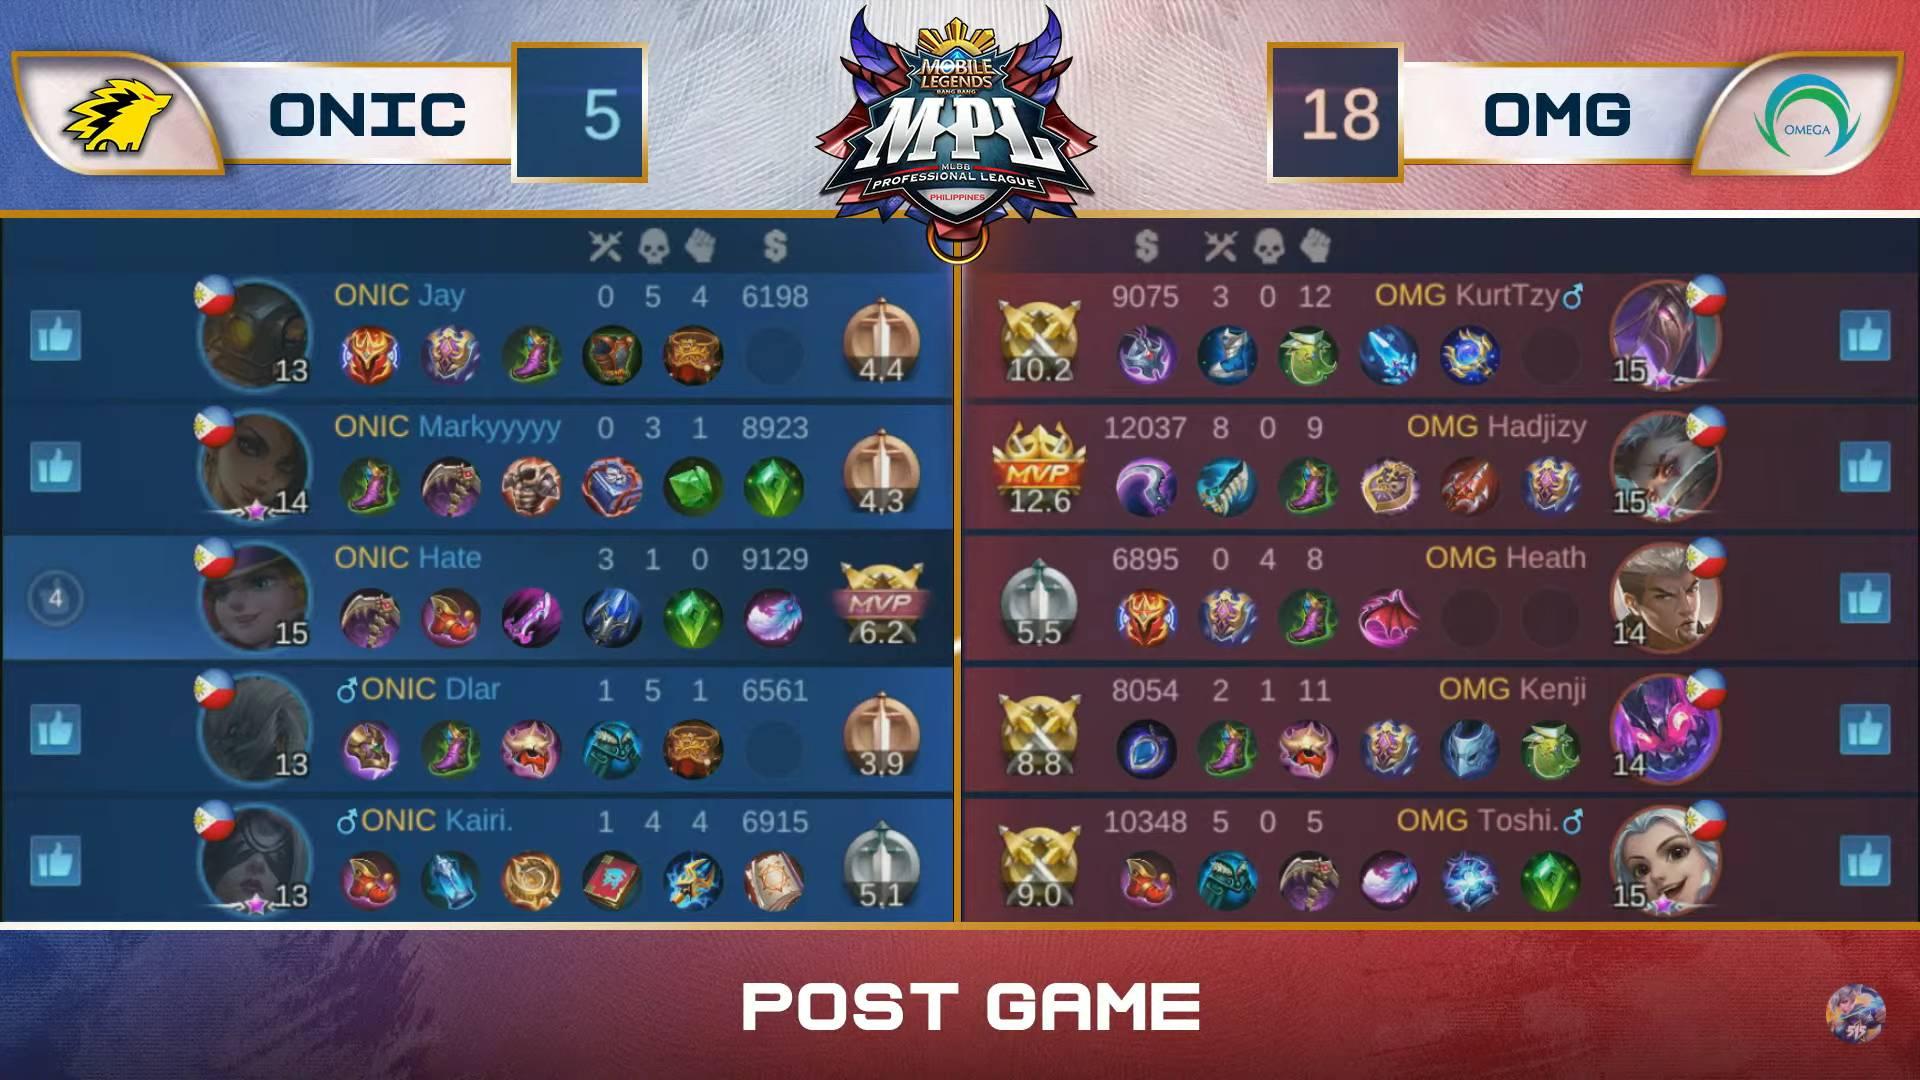 MPL-PH-Season-7-Omega-def-ONIC-Game-1 Heath returns to main five as SMART Omega thrashes ONIC in MPL PH ESports Mobile Legends MPL-PH News  - philippine sports news